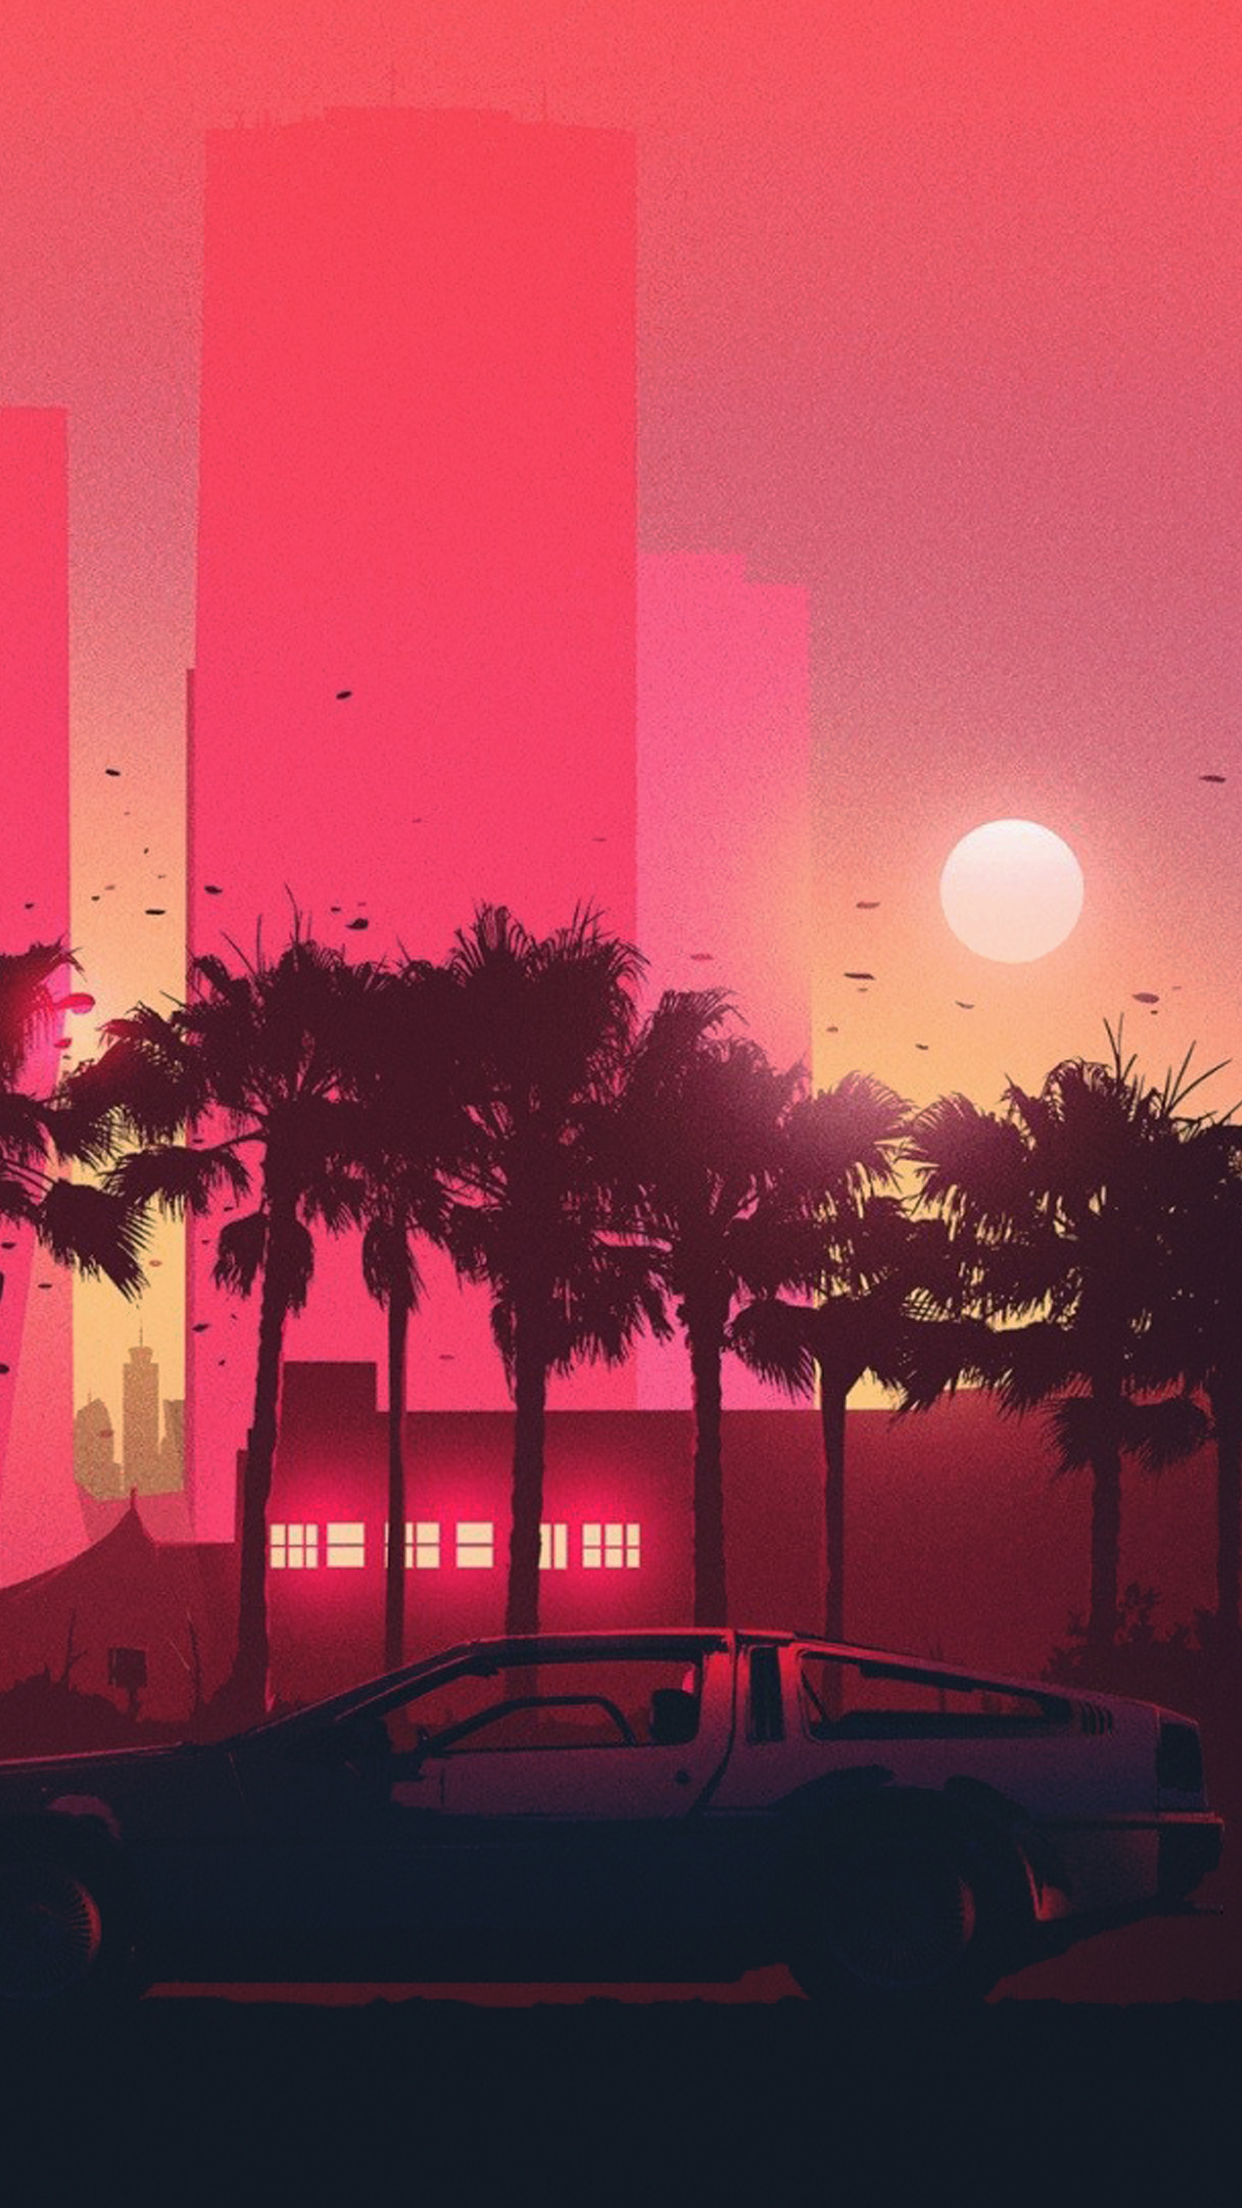 Hotline Miami Iphone Wallpaper Wallpapers Of The Week Minimal Scenery